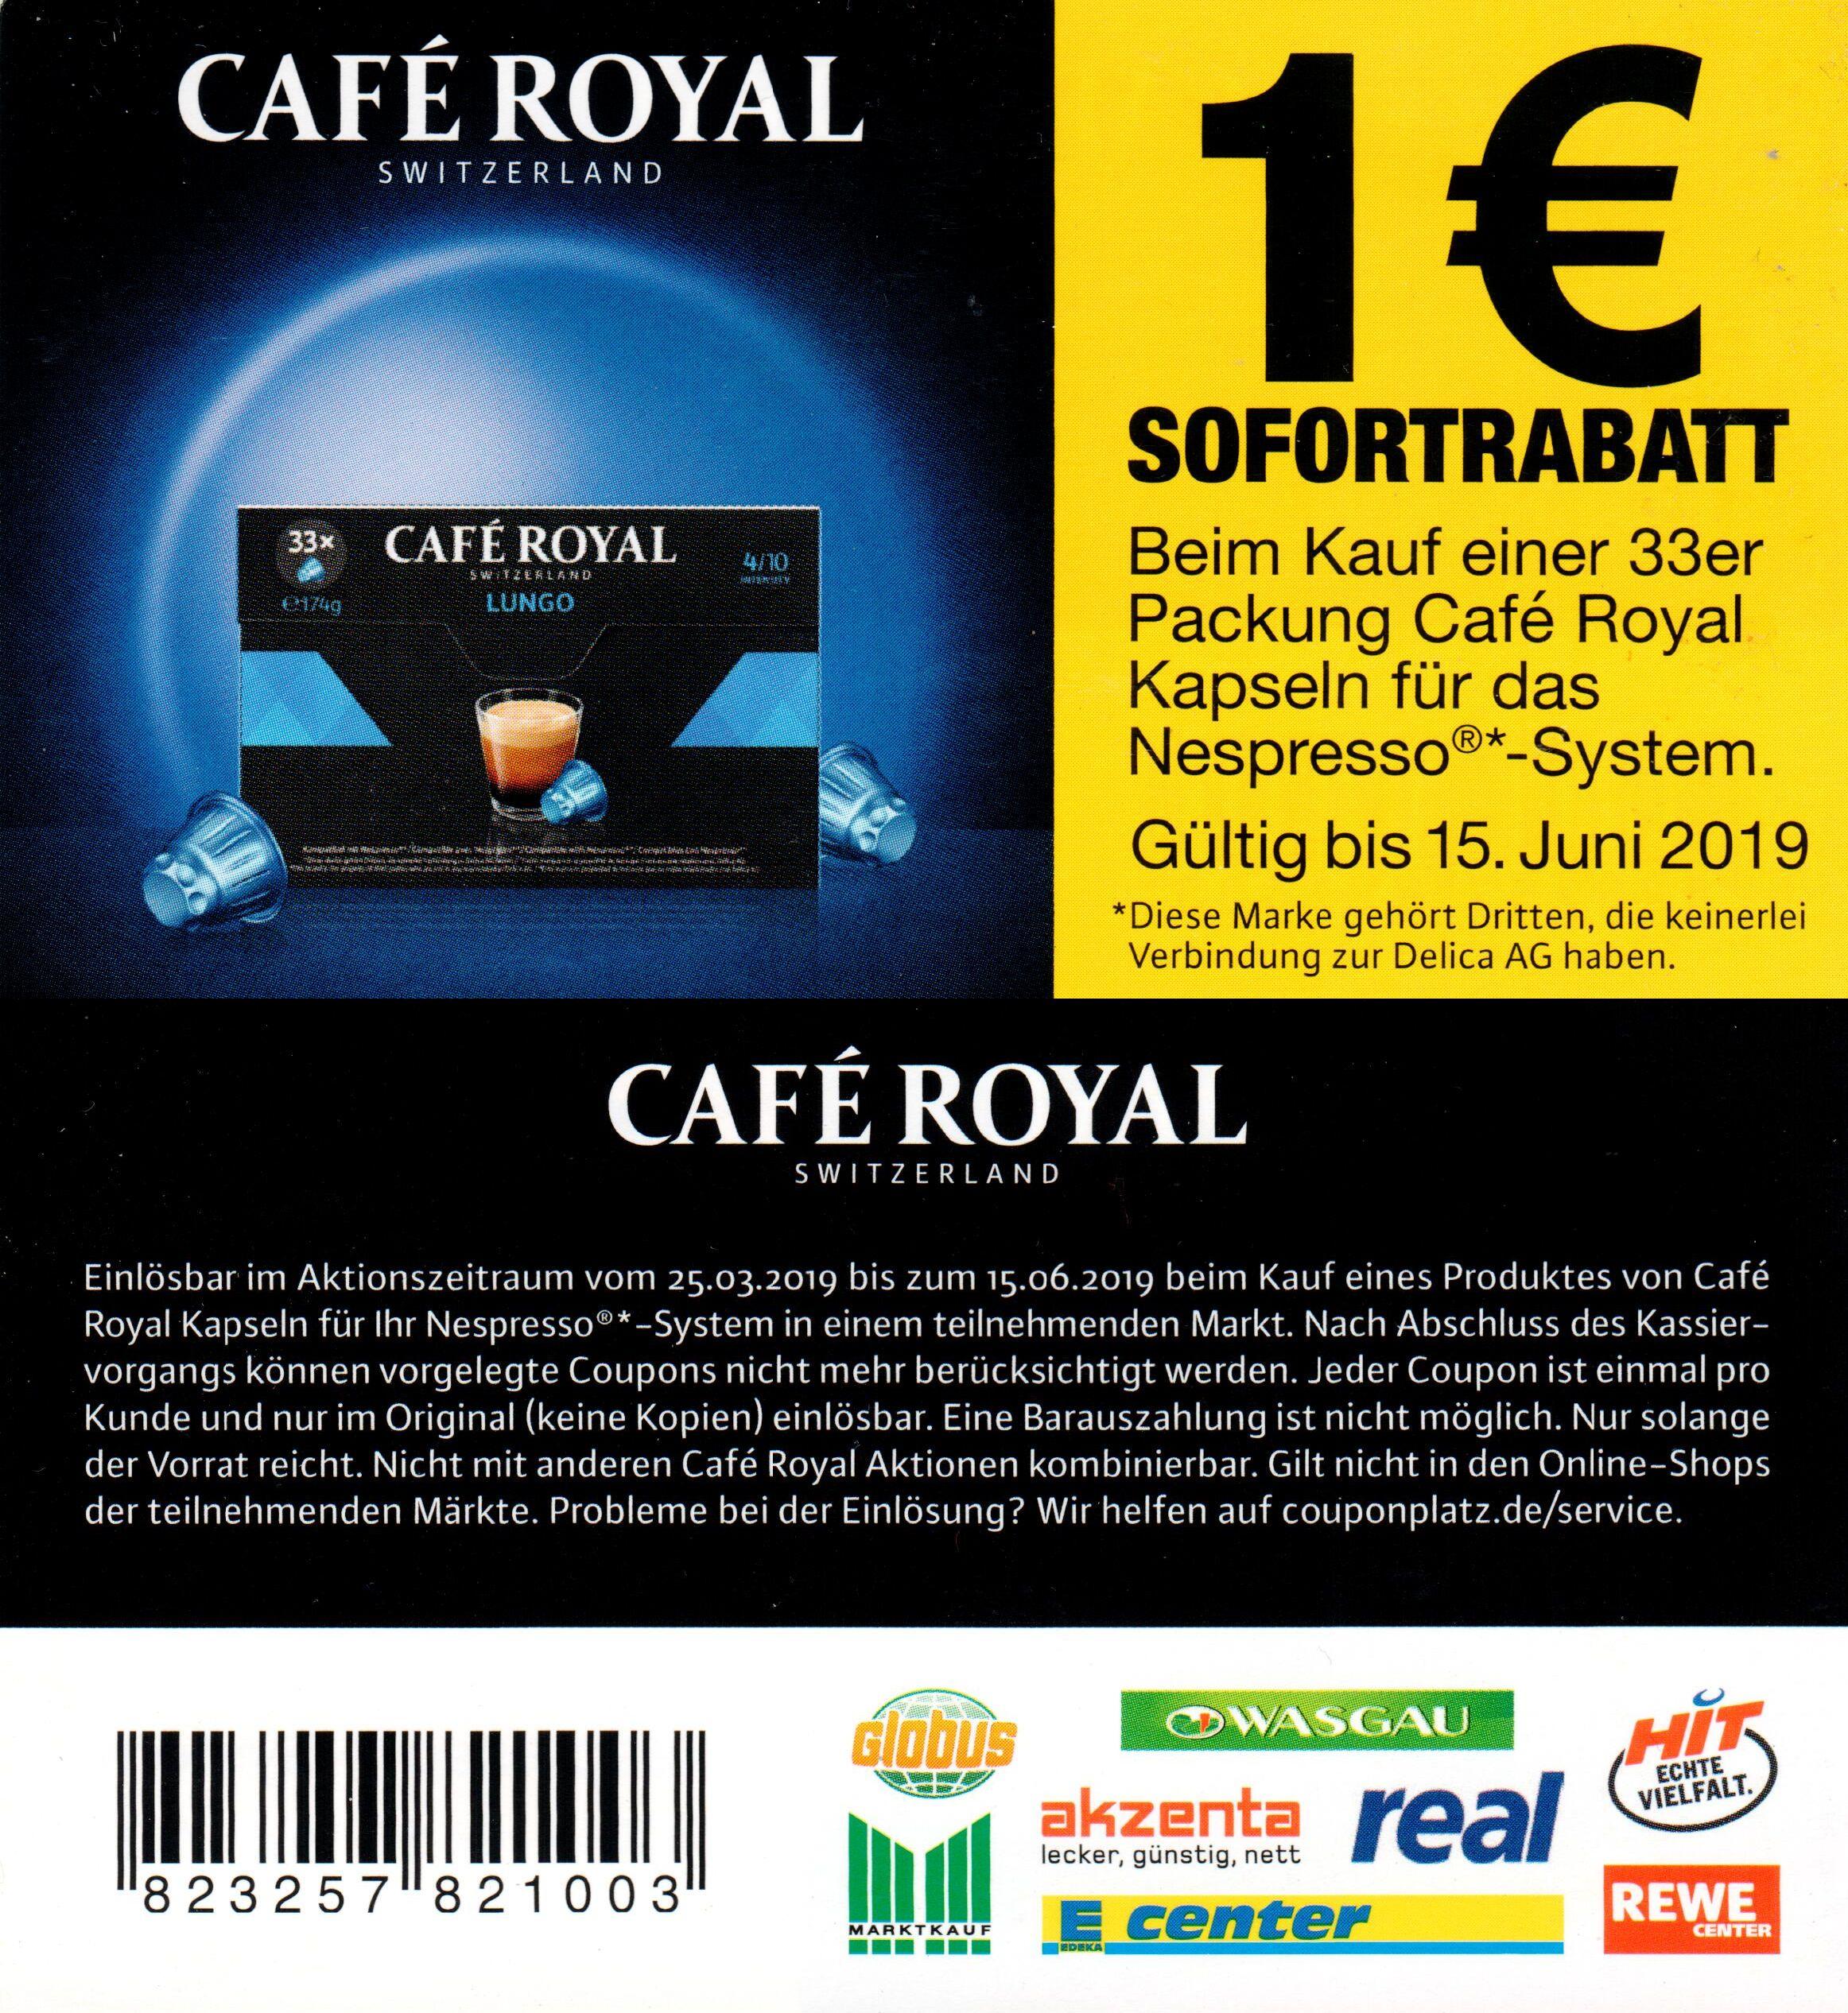 Café Royal - 3 verschiedene Sofort-Rabatt Coupons 0,50€ / 0,80€ / 1,00€ bis 15.06.2019